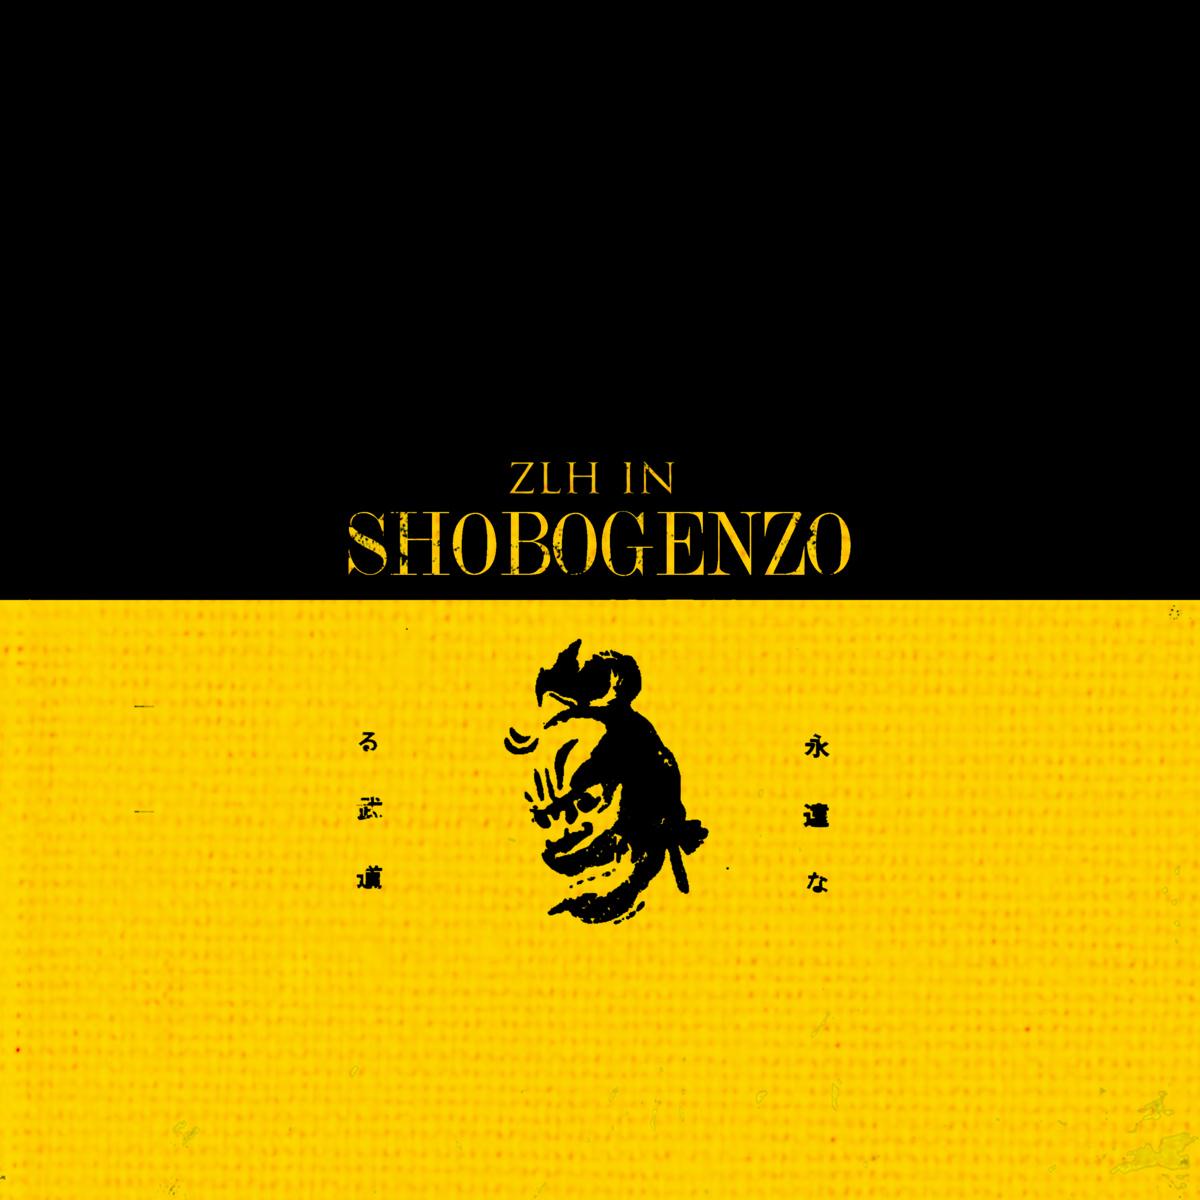 Zulihs_aka_zlh_presenta_in_shobogenzo